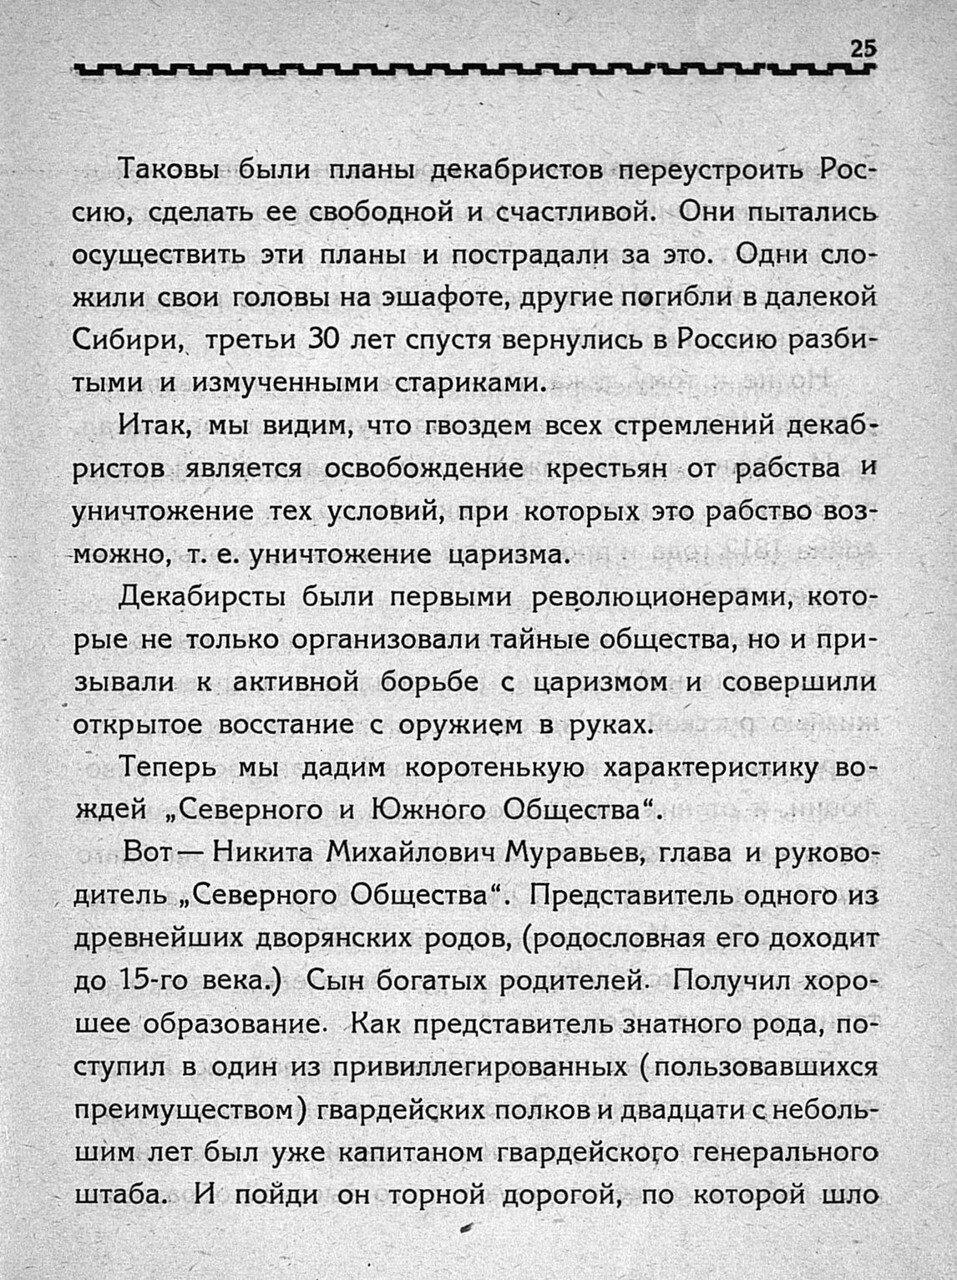 https://img-fotki.yandex.ru/get/96770/199368979.23/0_1bfadd_178624fa_XXXL.jpg